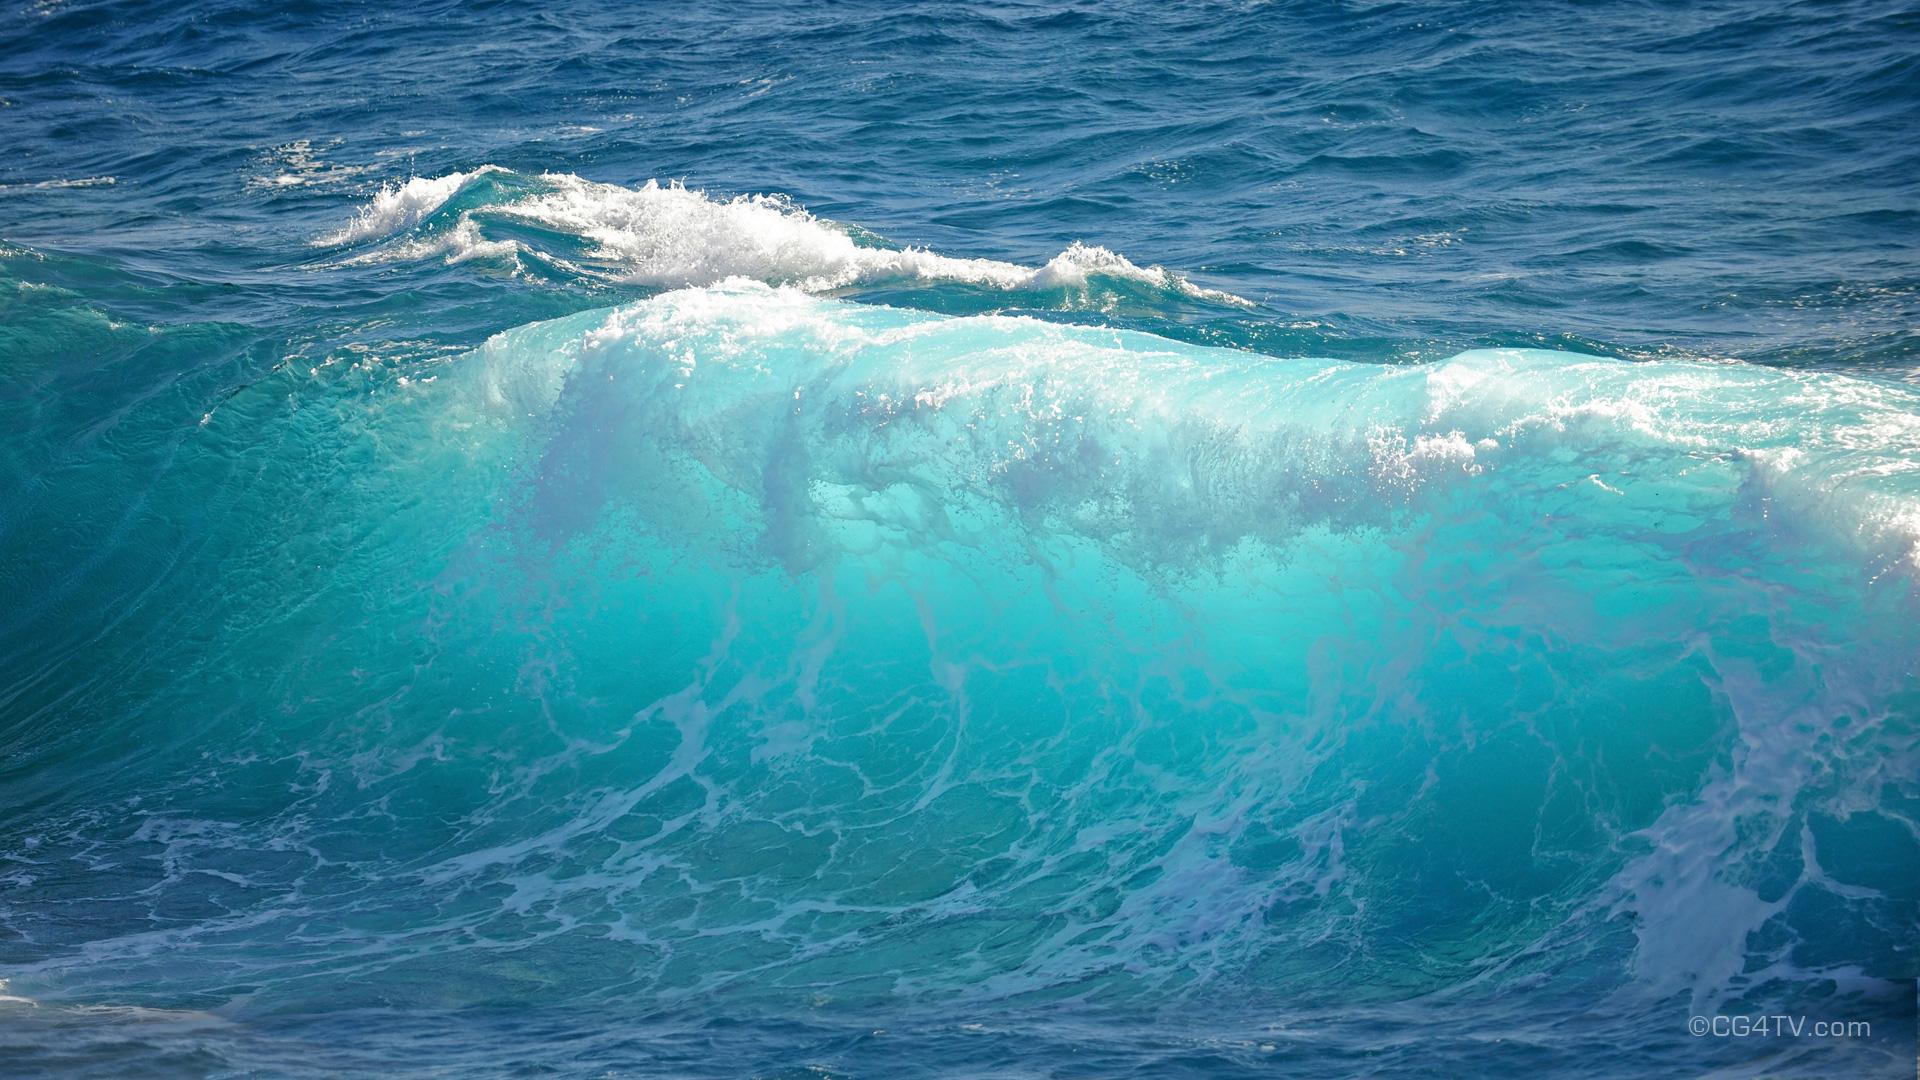 Happy Water Week everyone In honor of the UNs World Water Week 1920x1080